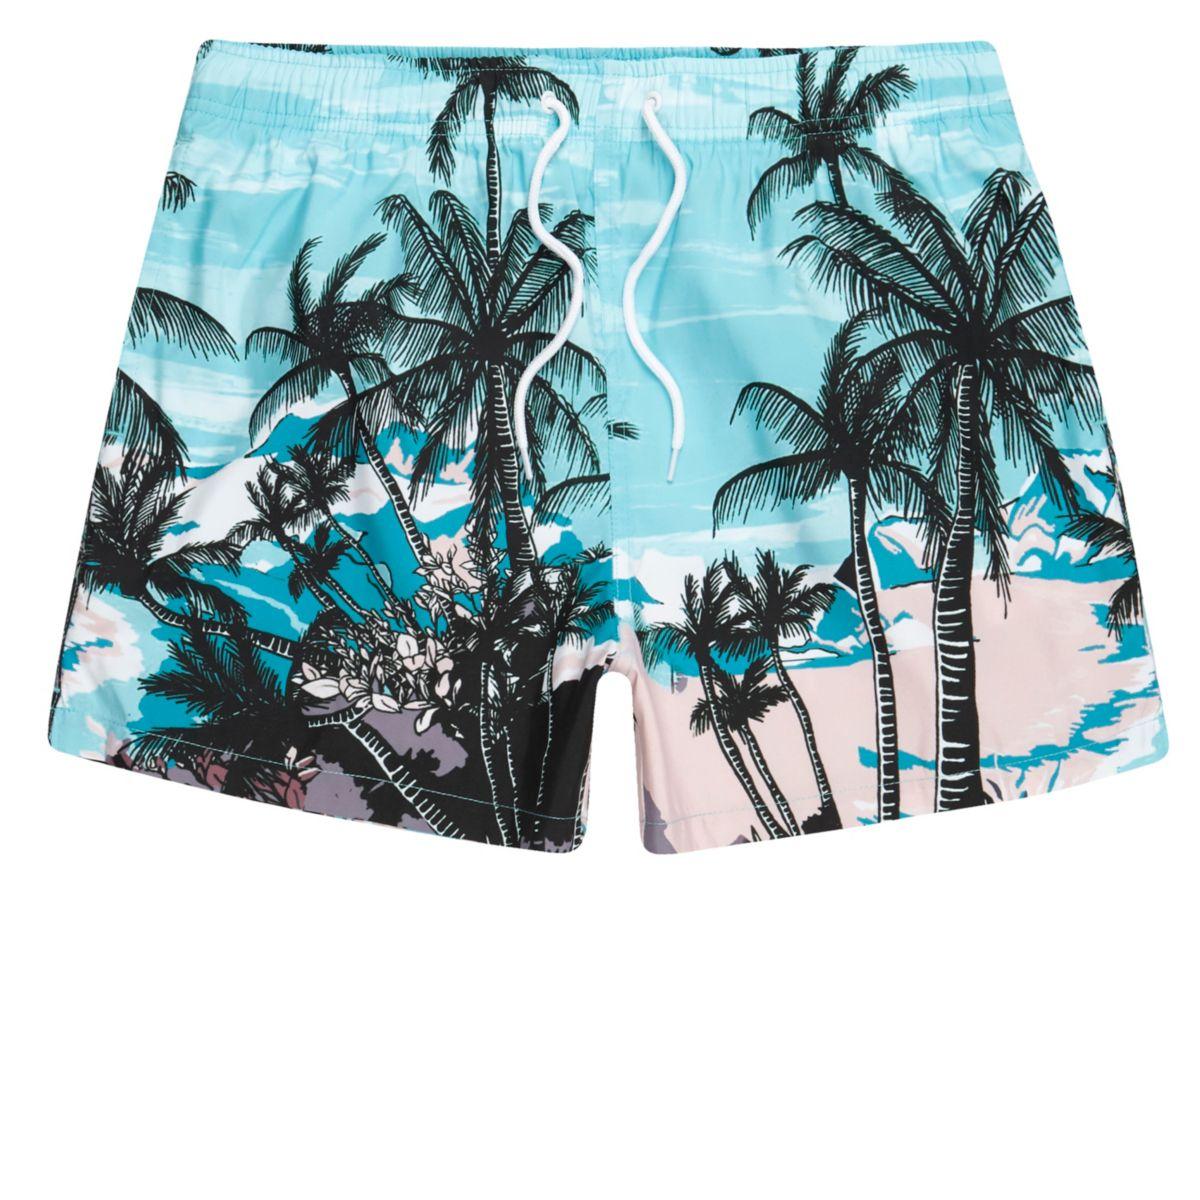 Blue palm tree beach scene print swim shorts